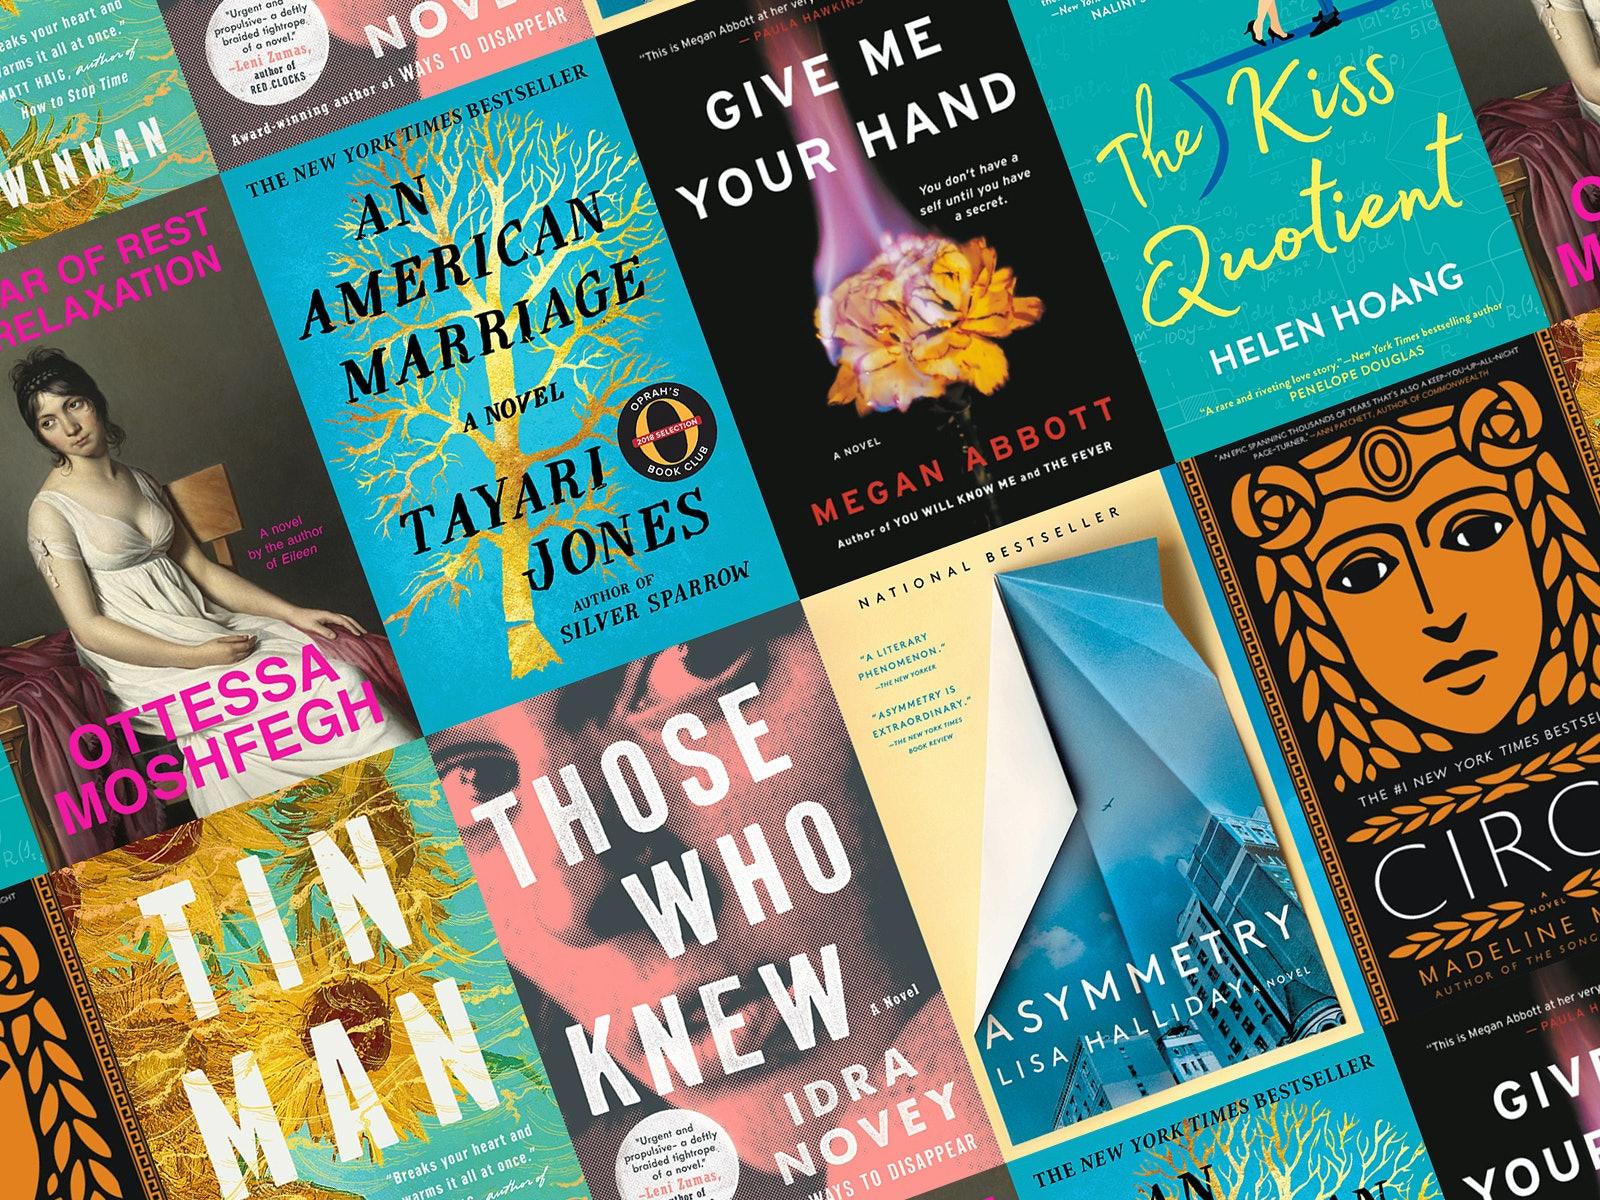 dating advice for women books 2017 2018 season